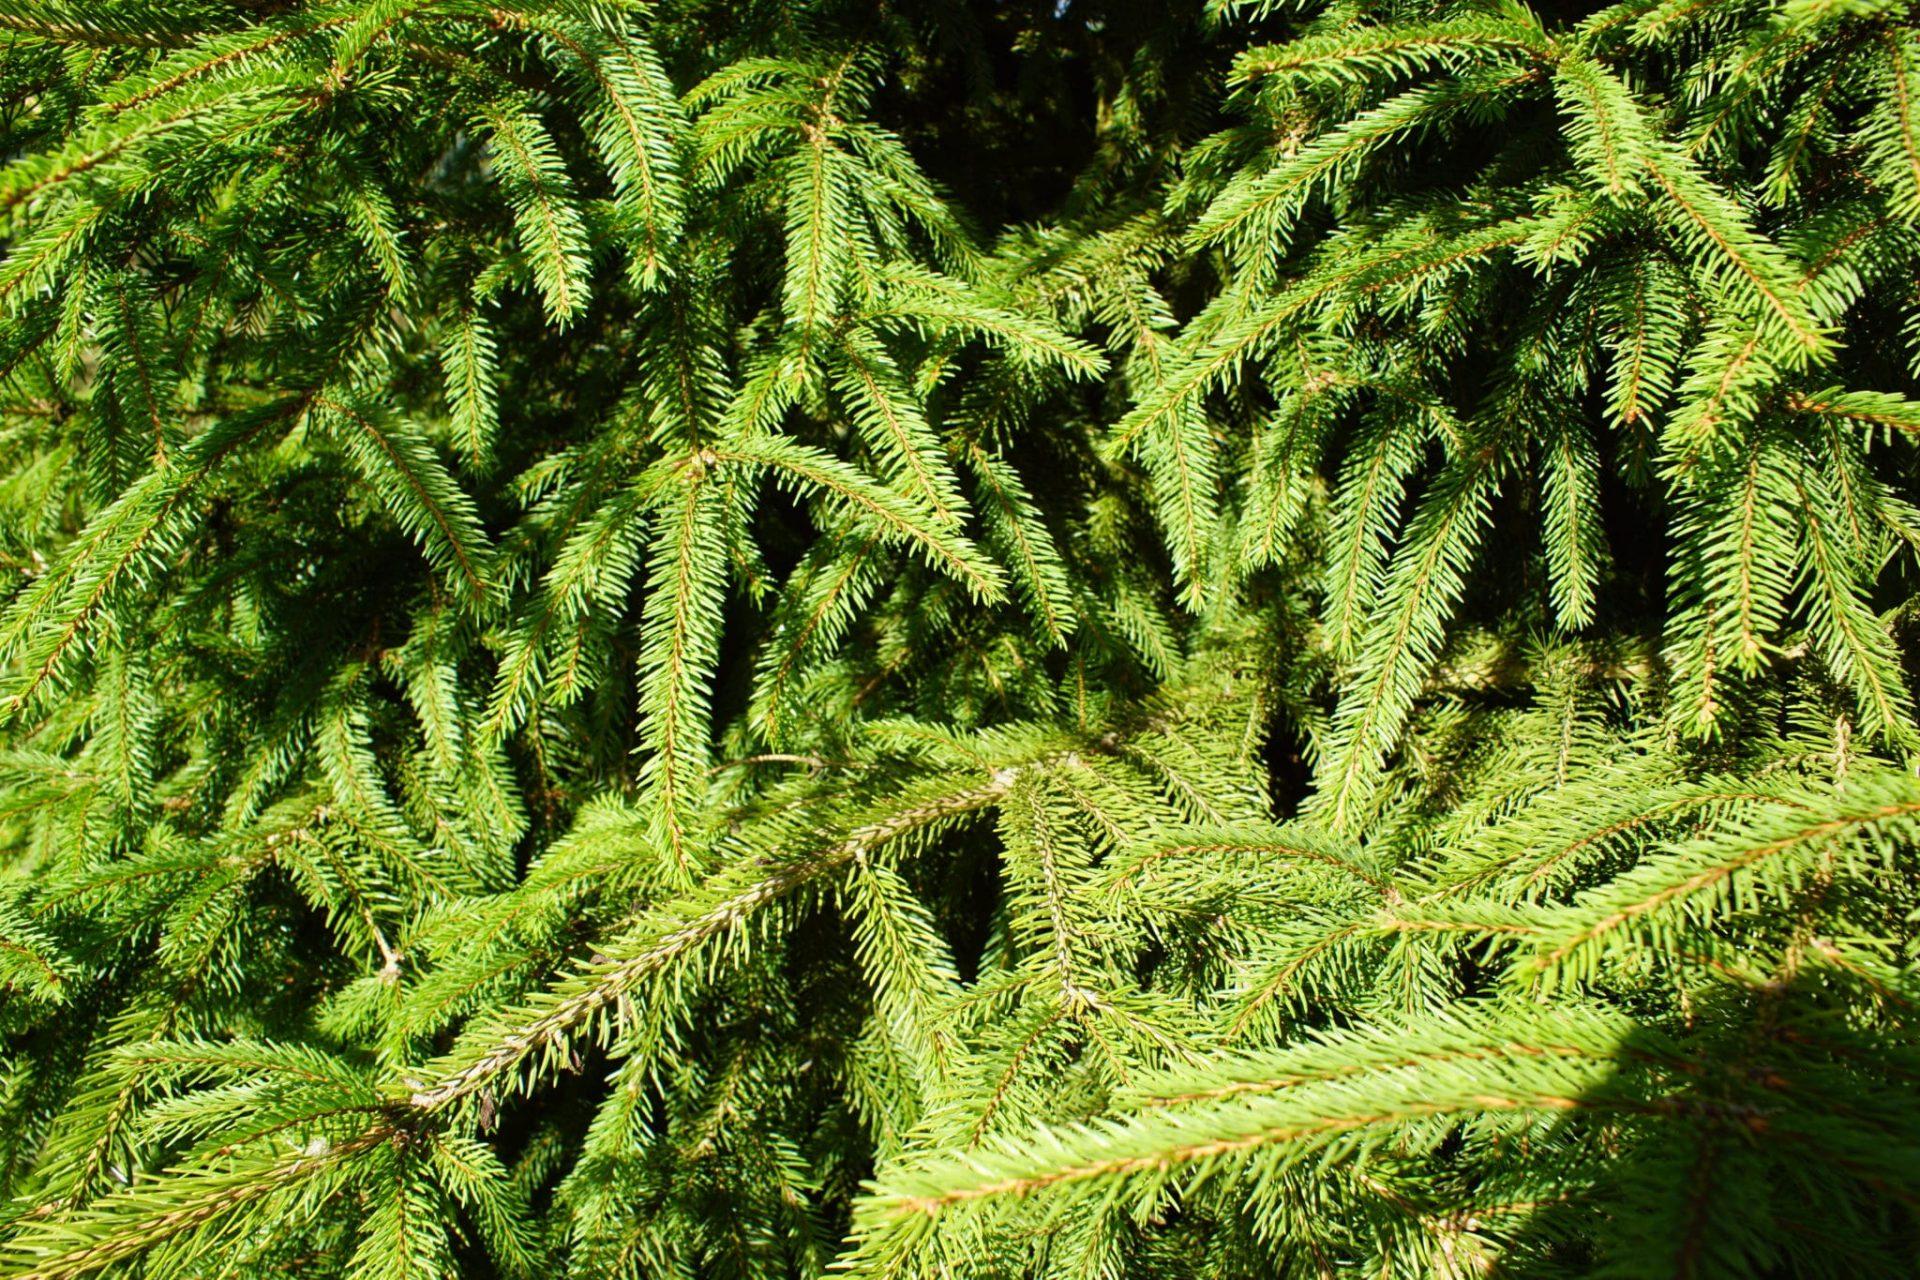 Norway Spruce foliage